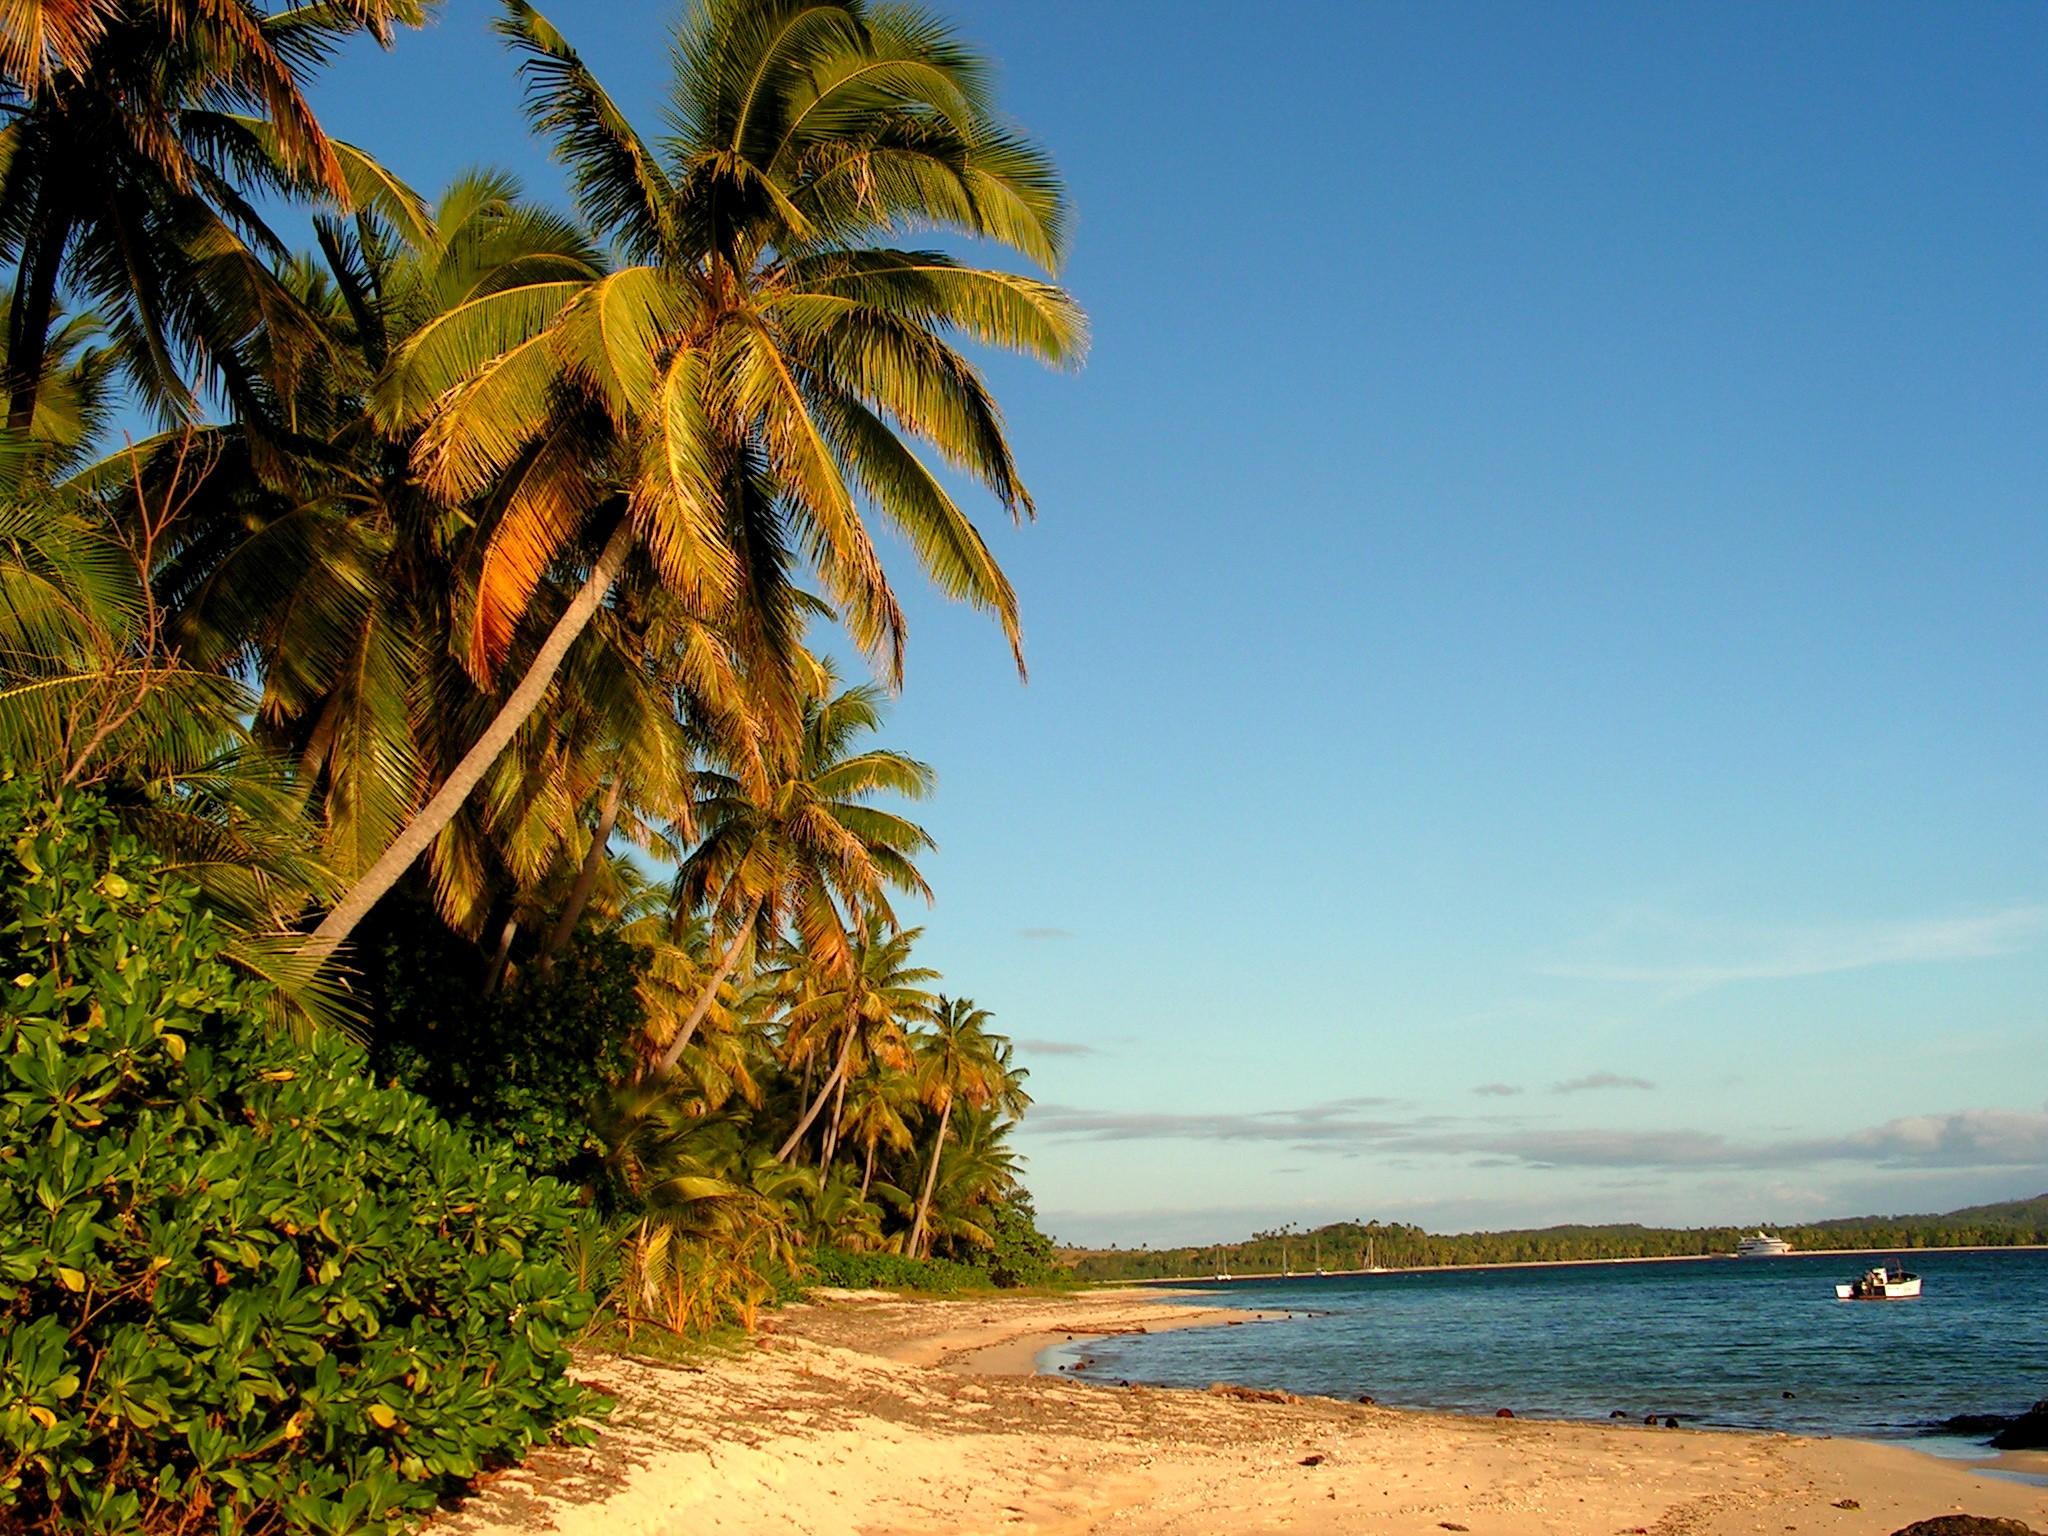 Photo Credit https://www.wikiwand.com/en/Fiji